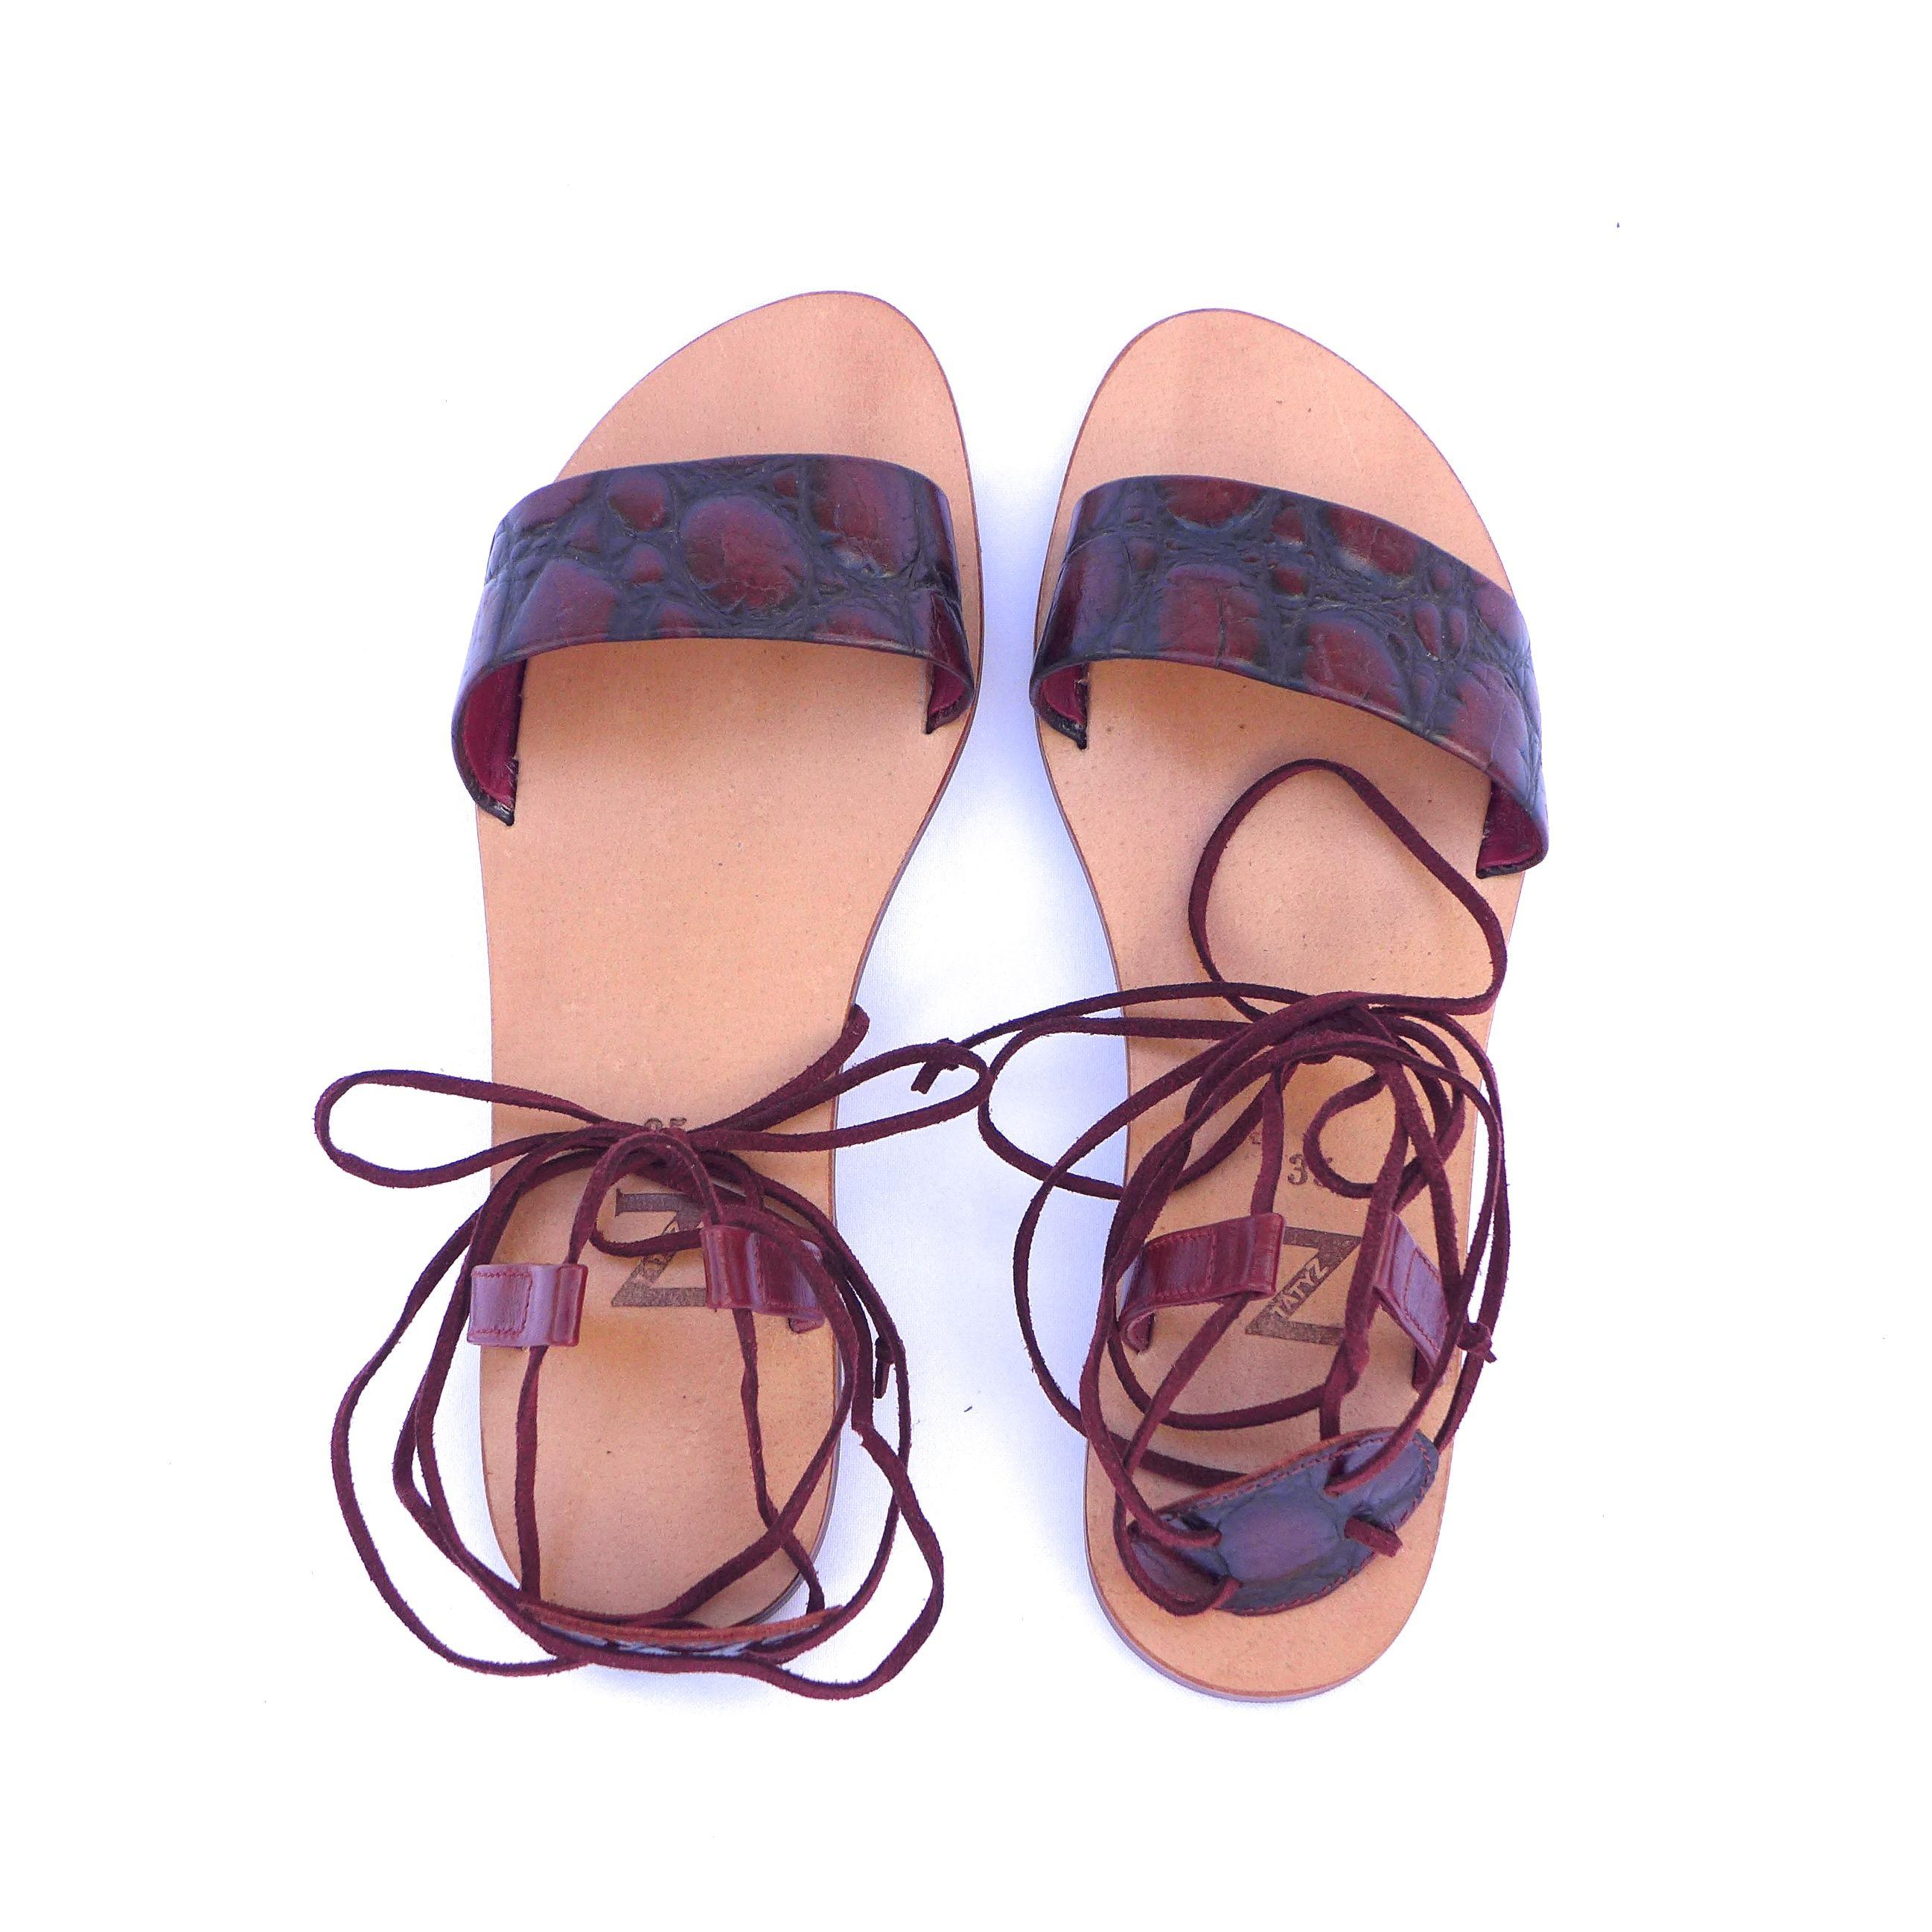 Sandals summer, Sandals, Flat sandals